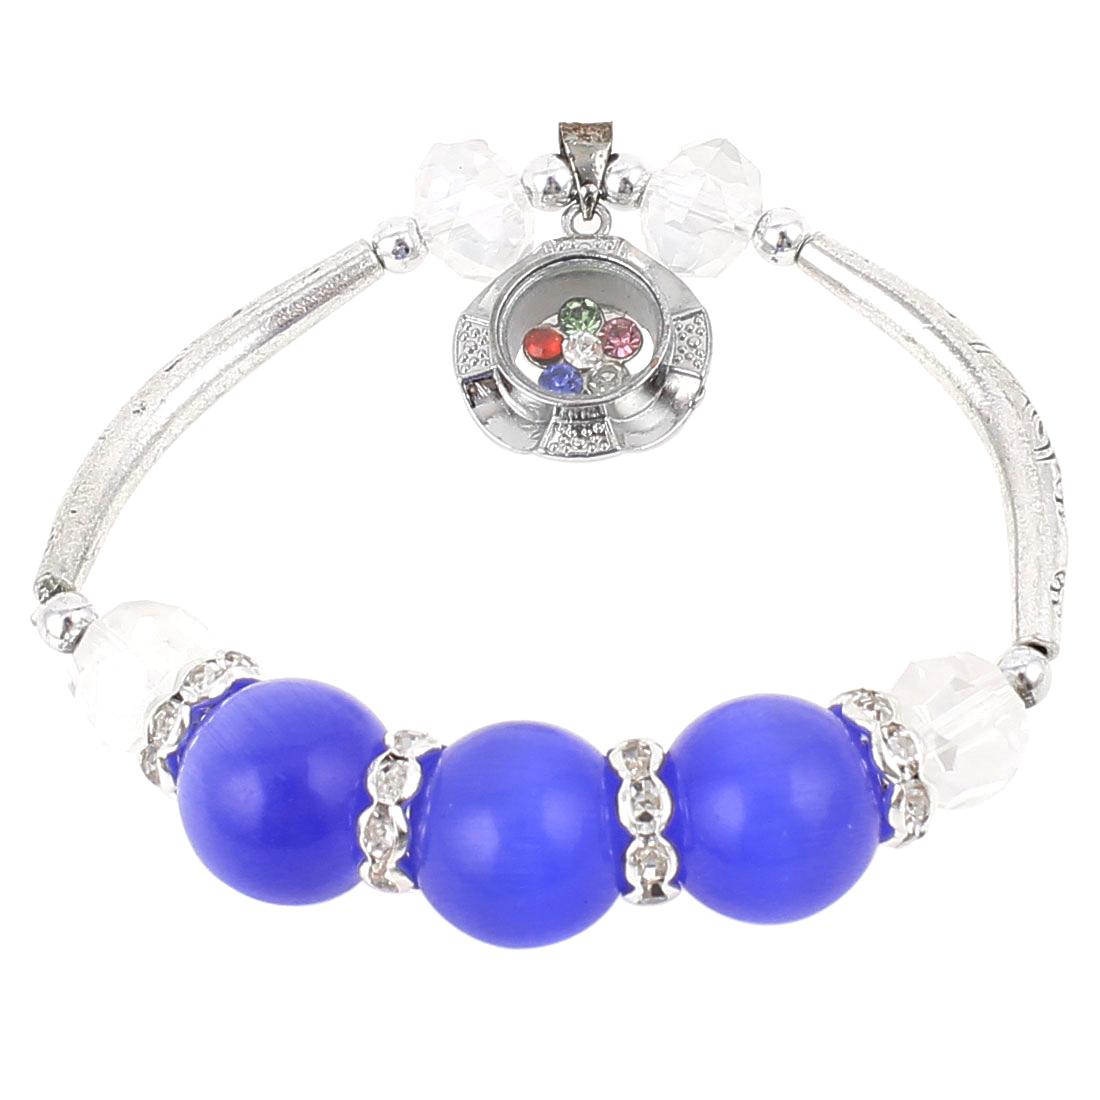 Lady Flower Pendant Decor Elastic Round Beads Lucky Bracelet Bangle Silver Tone Blue